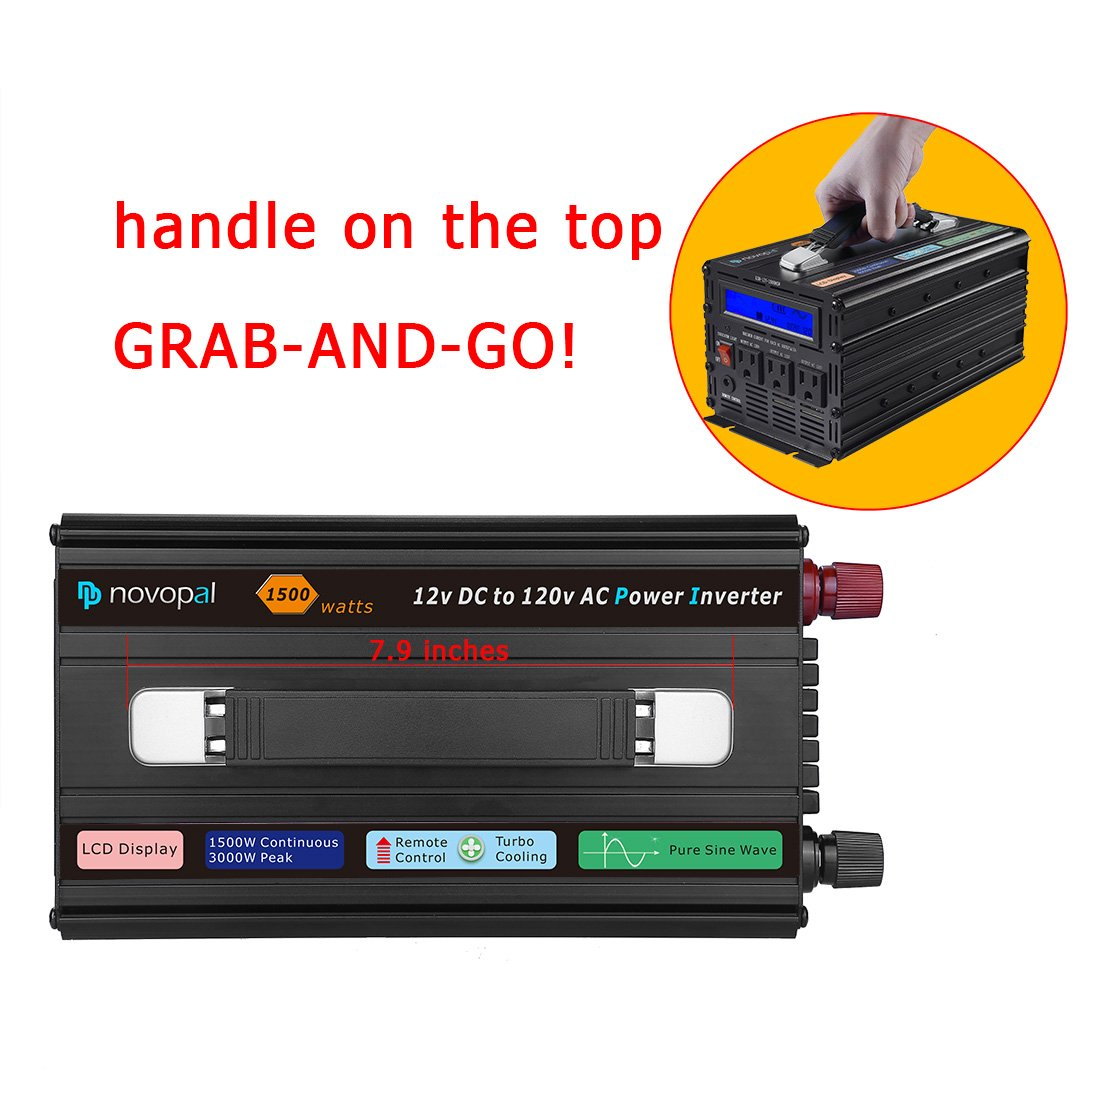 Novopal Power Inverter Pure Sine Wave True Idea 1500 Watt 3 Ac Outlets Dc 12v To 120v With Remote Control Big Lcd Displaysurge 3000w